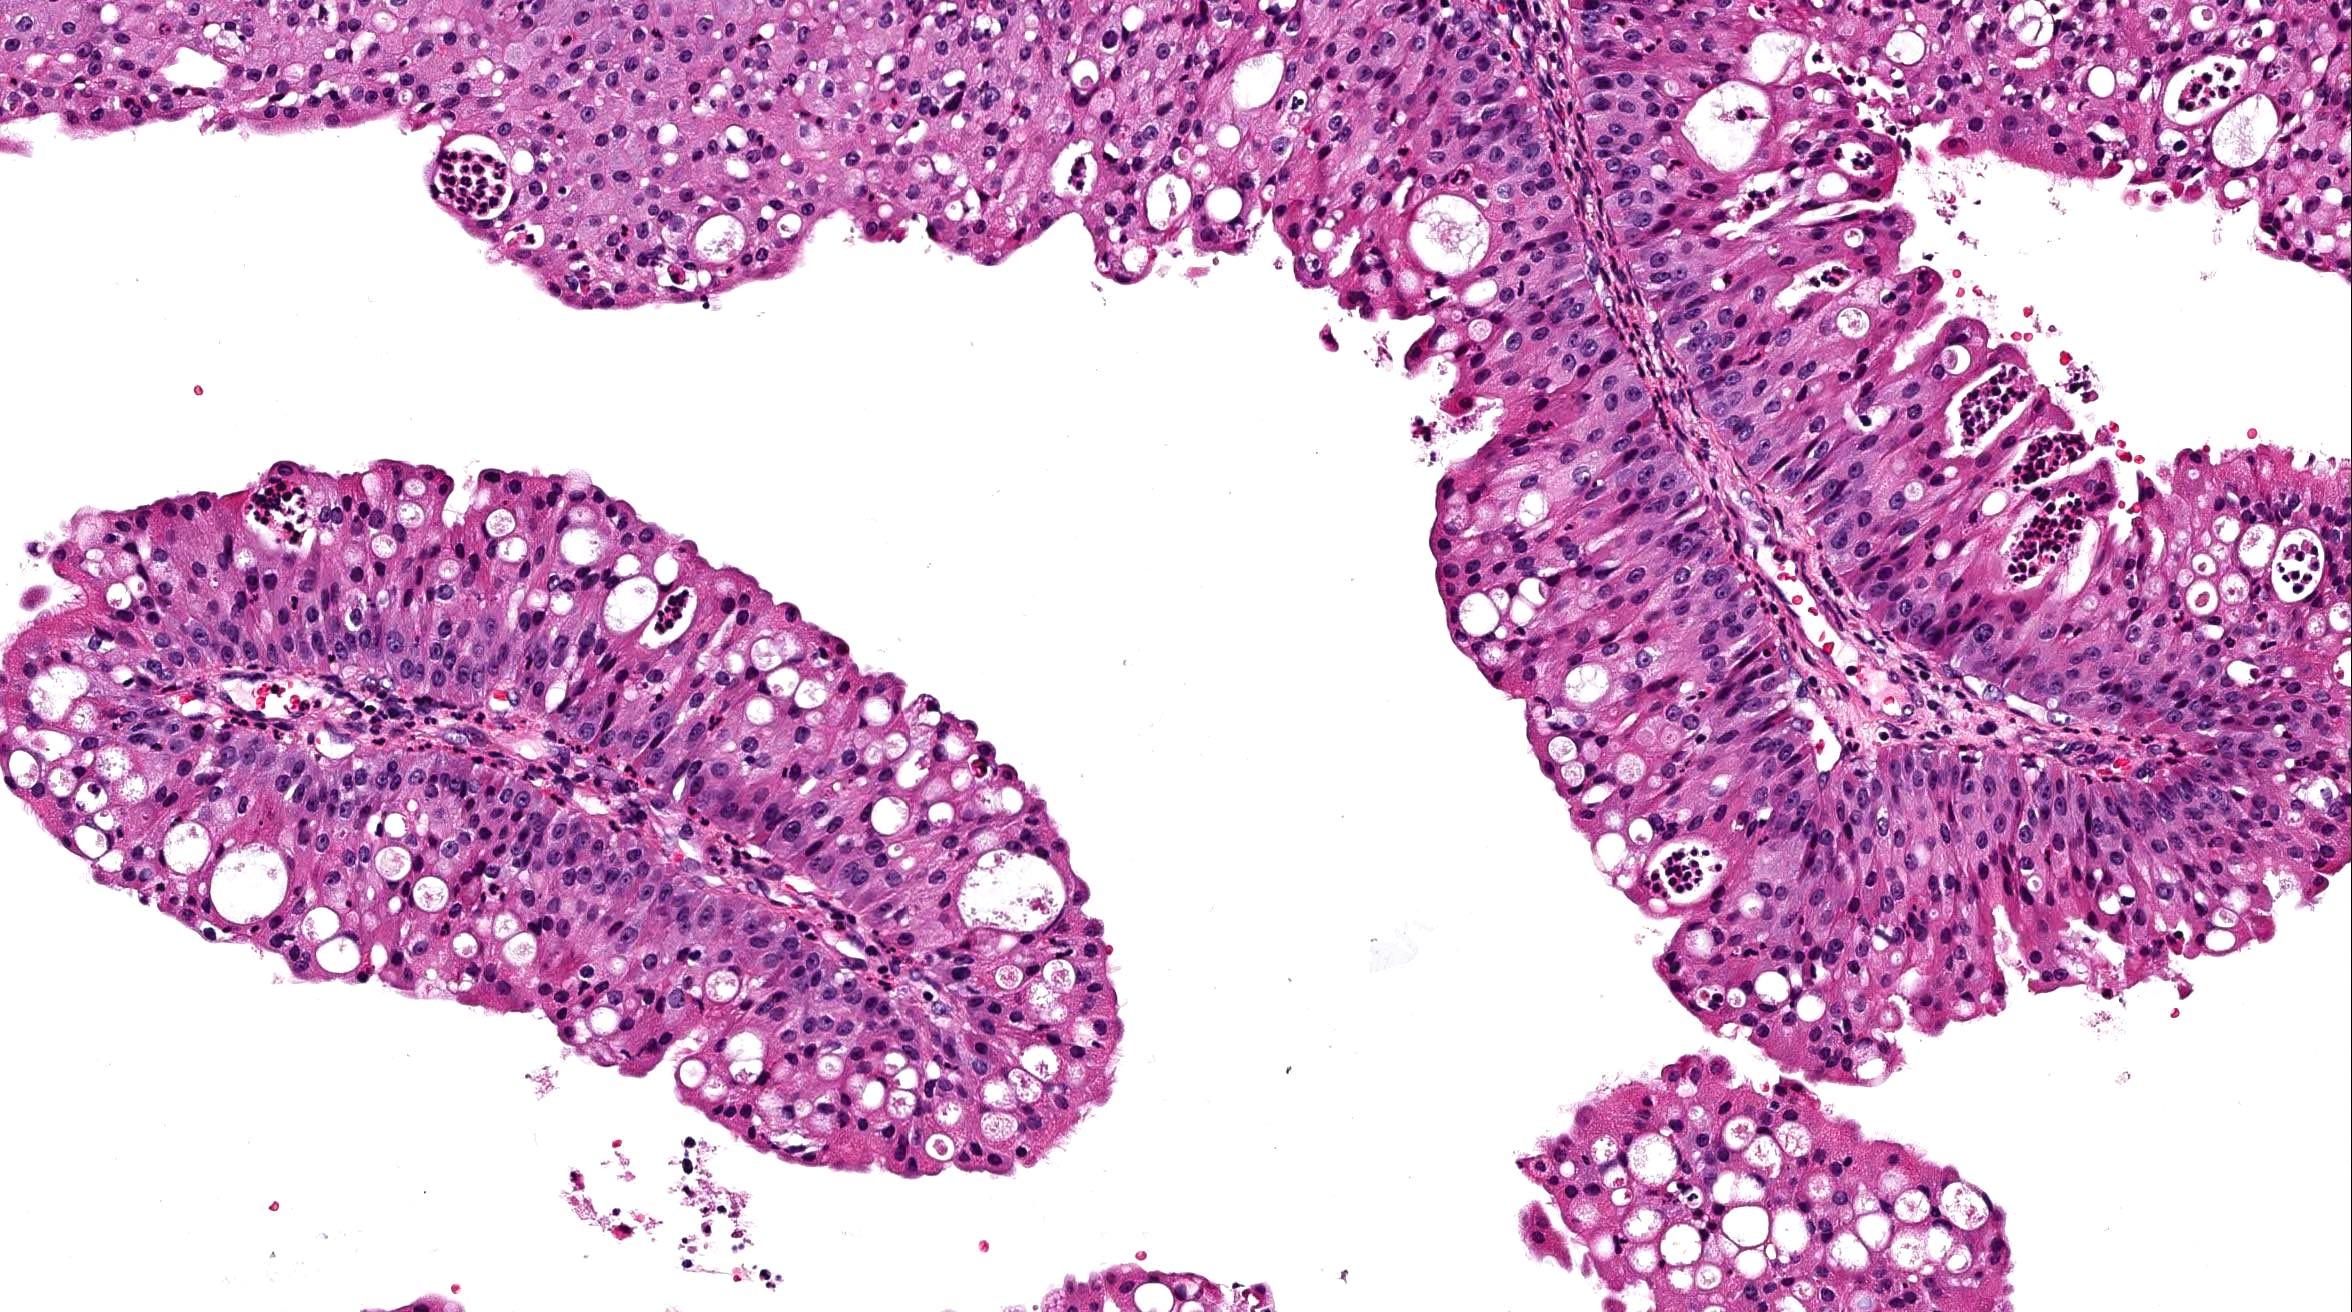 intraductal papilloma path outlines medicament prescris